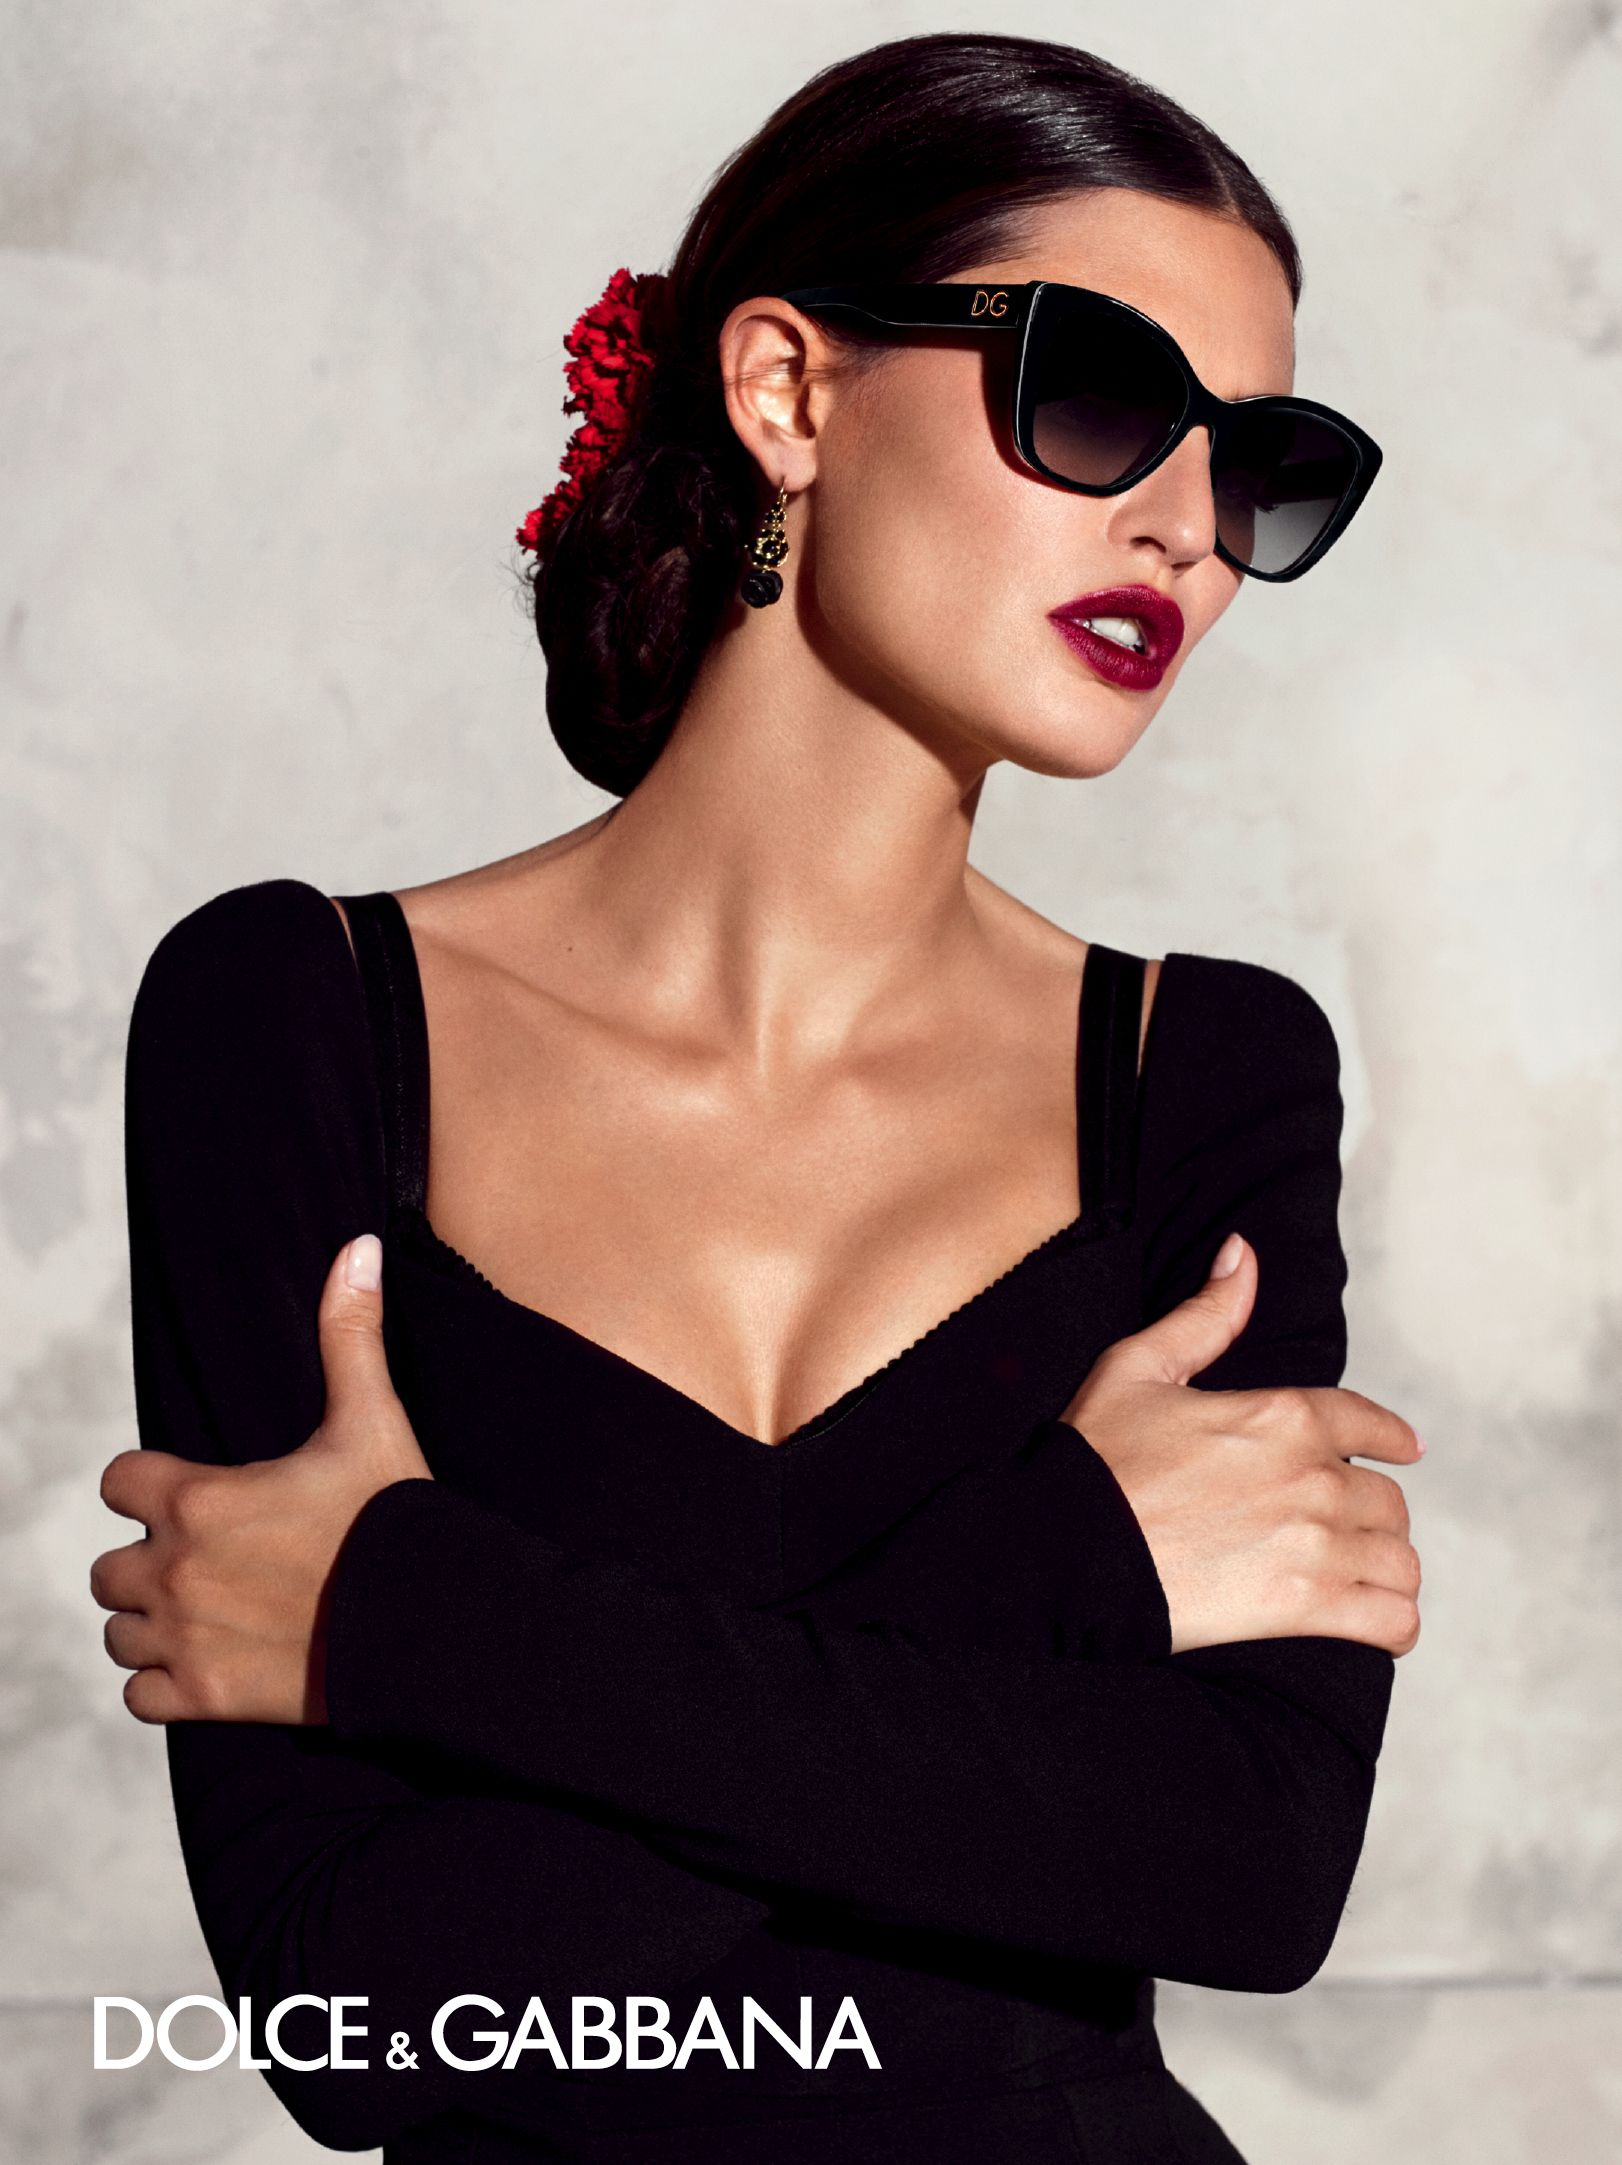 Dolce&Gabbana Summer 2015 Eyewear Advertising Campaign…